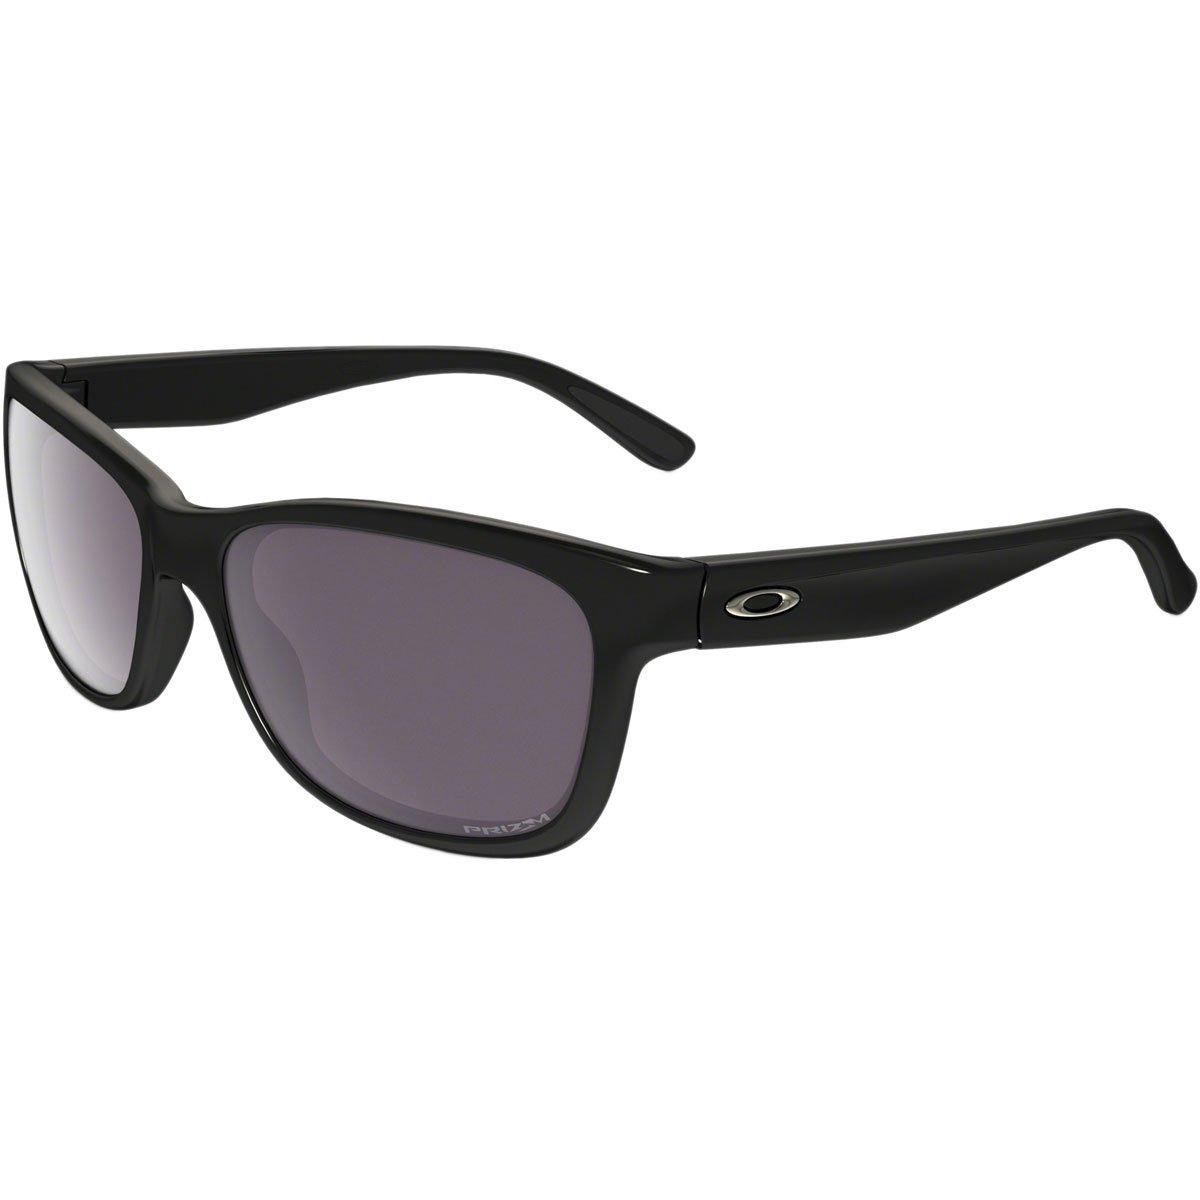 Oakley Womens Forehand Polarized Sunglasses, Polished Black/Prizm Daily, One Size